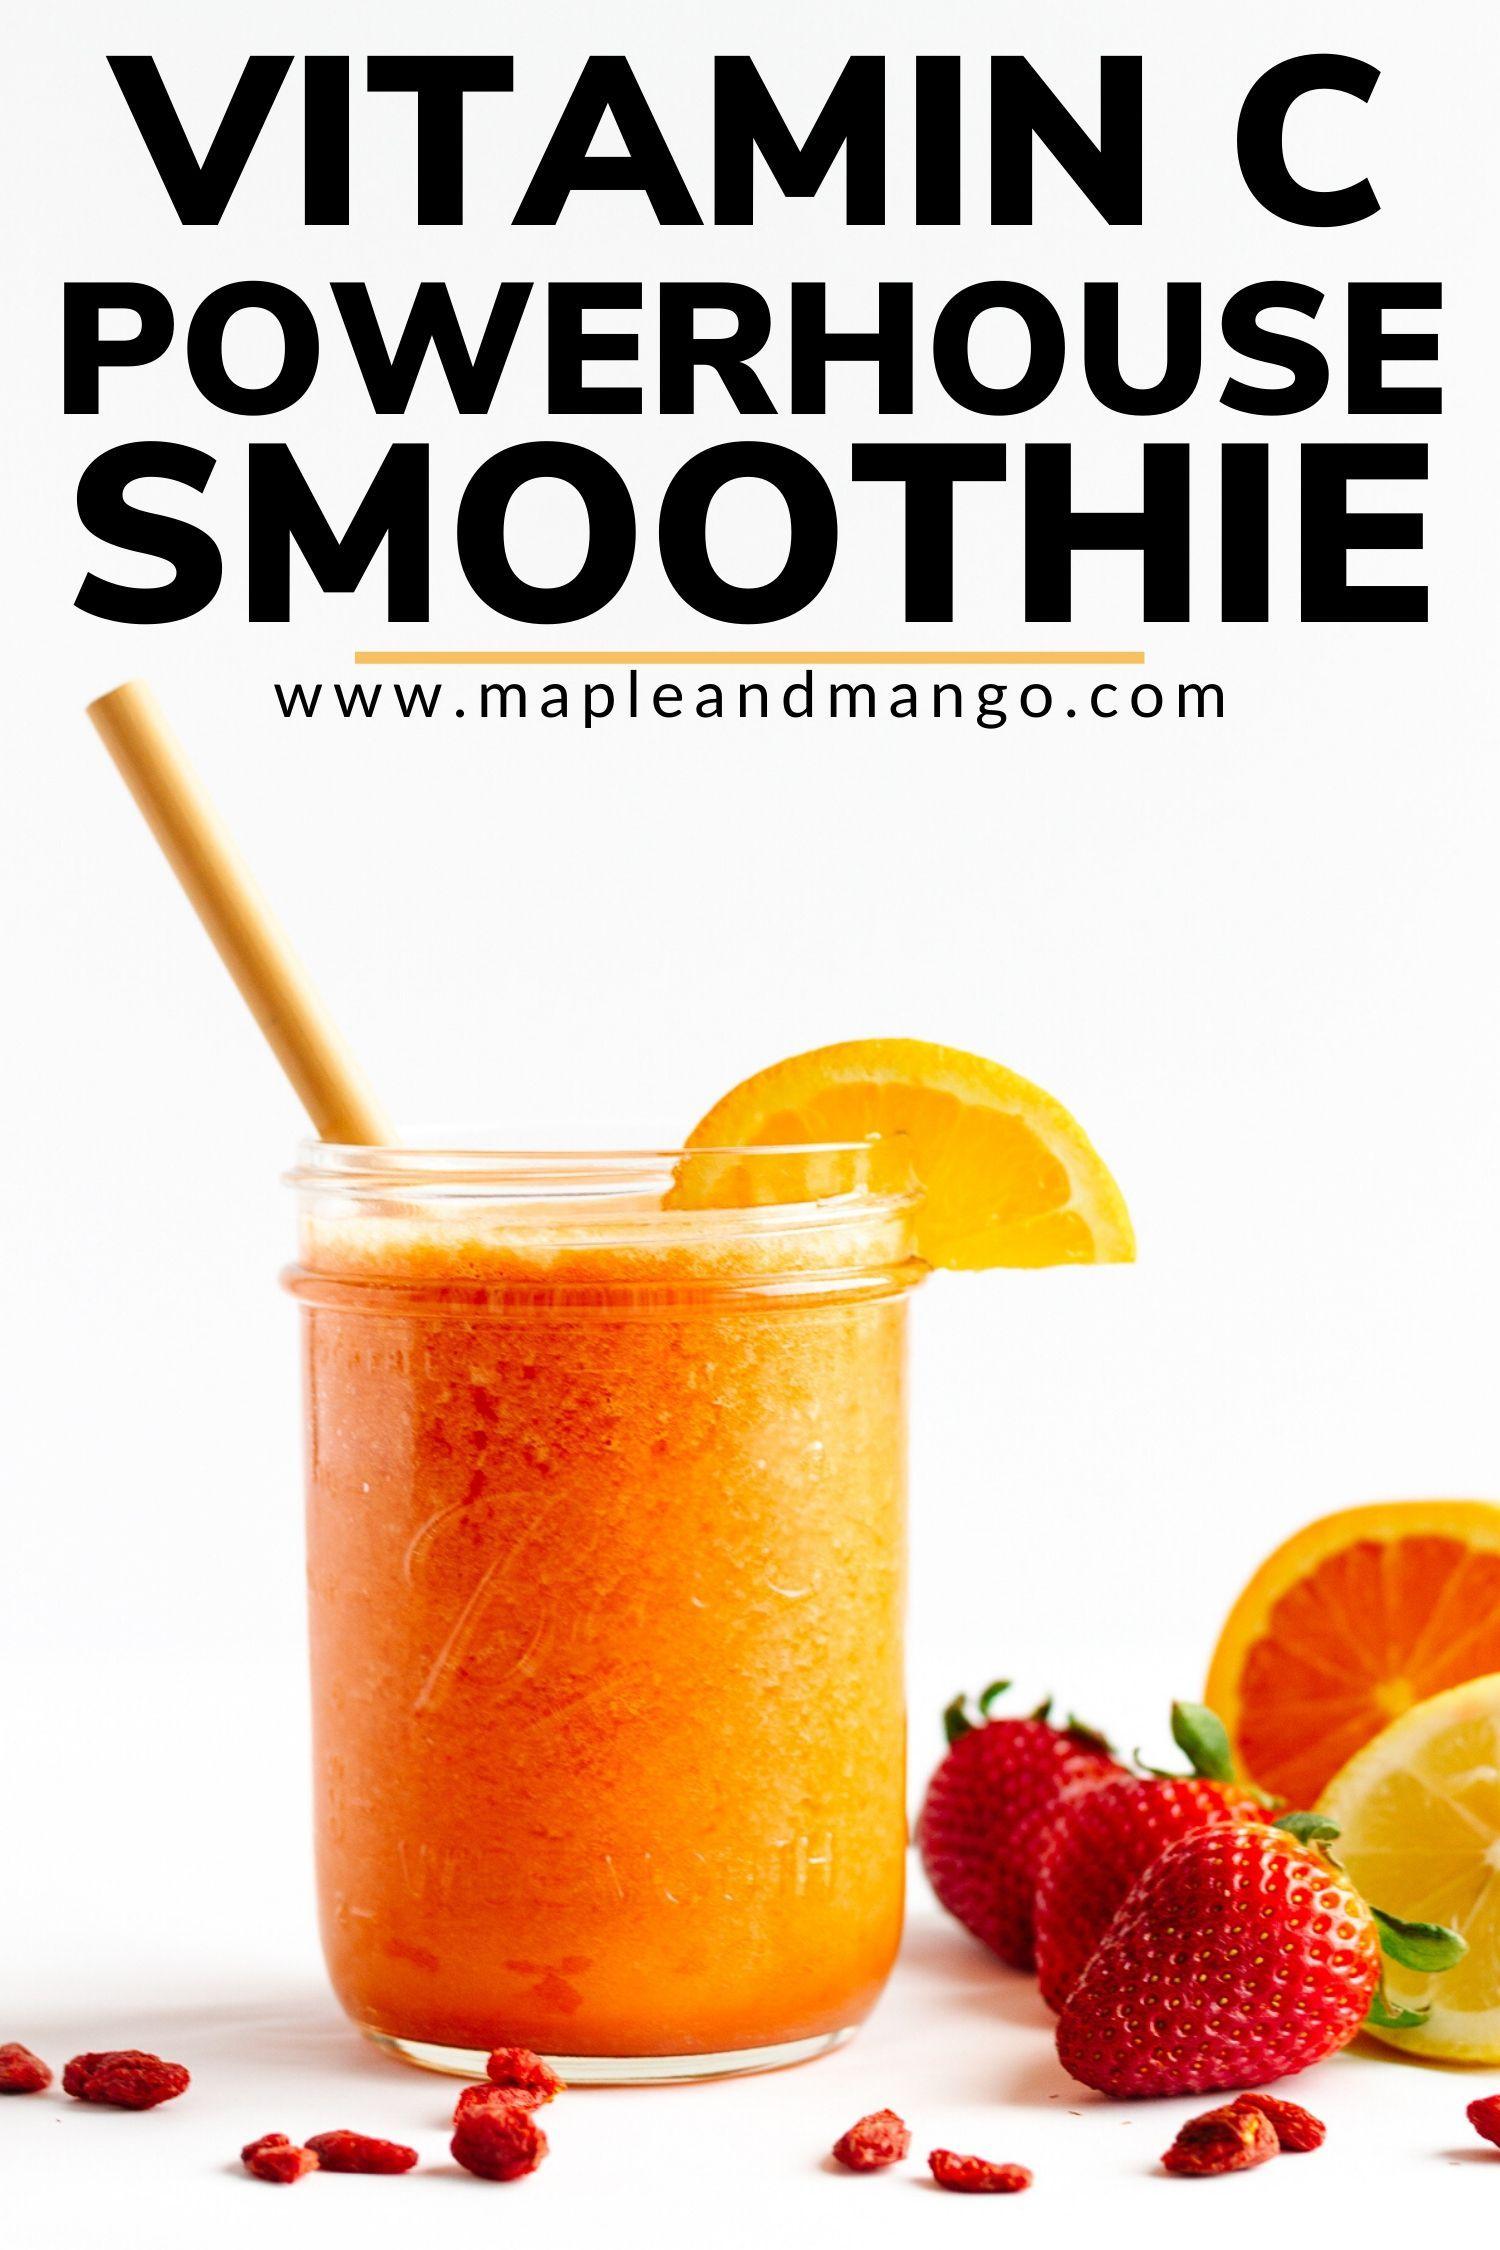 Vitamin C Powerhouse Smoothie Immune Boosting Maple Mango Recipe In 2020 Immune Boosting Smoothie Vitamin C Rich Fruits Vitamins